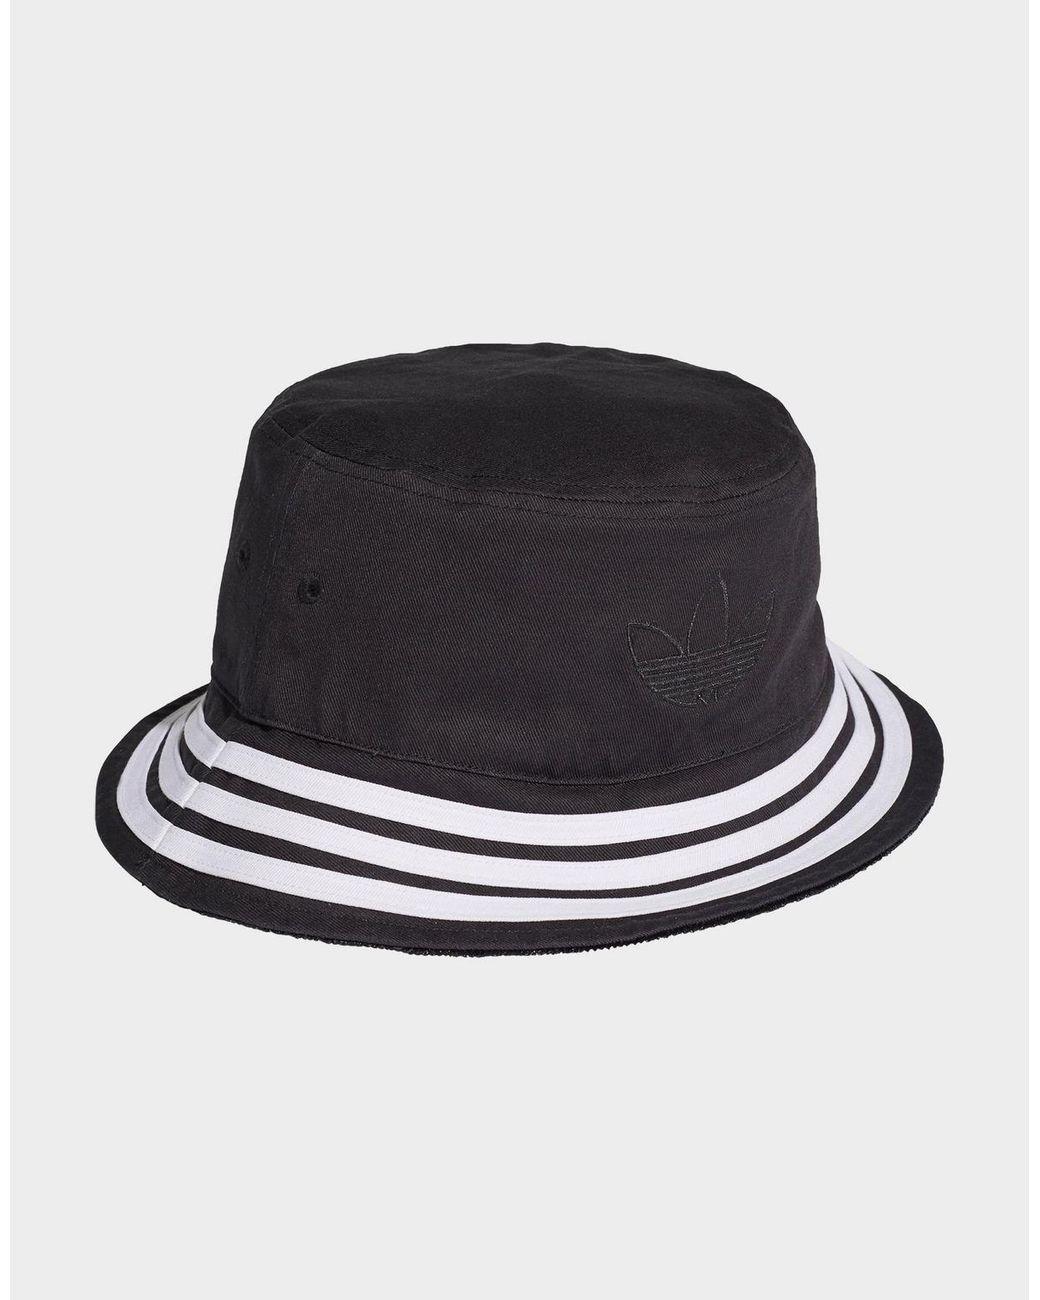 Adidas Originals Velvet Trefoil Bucket Hat In Black For Men Lyst